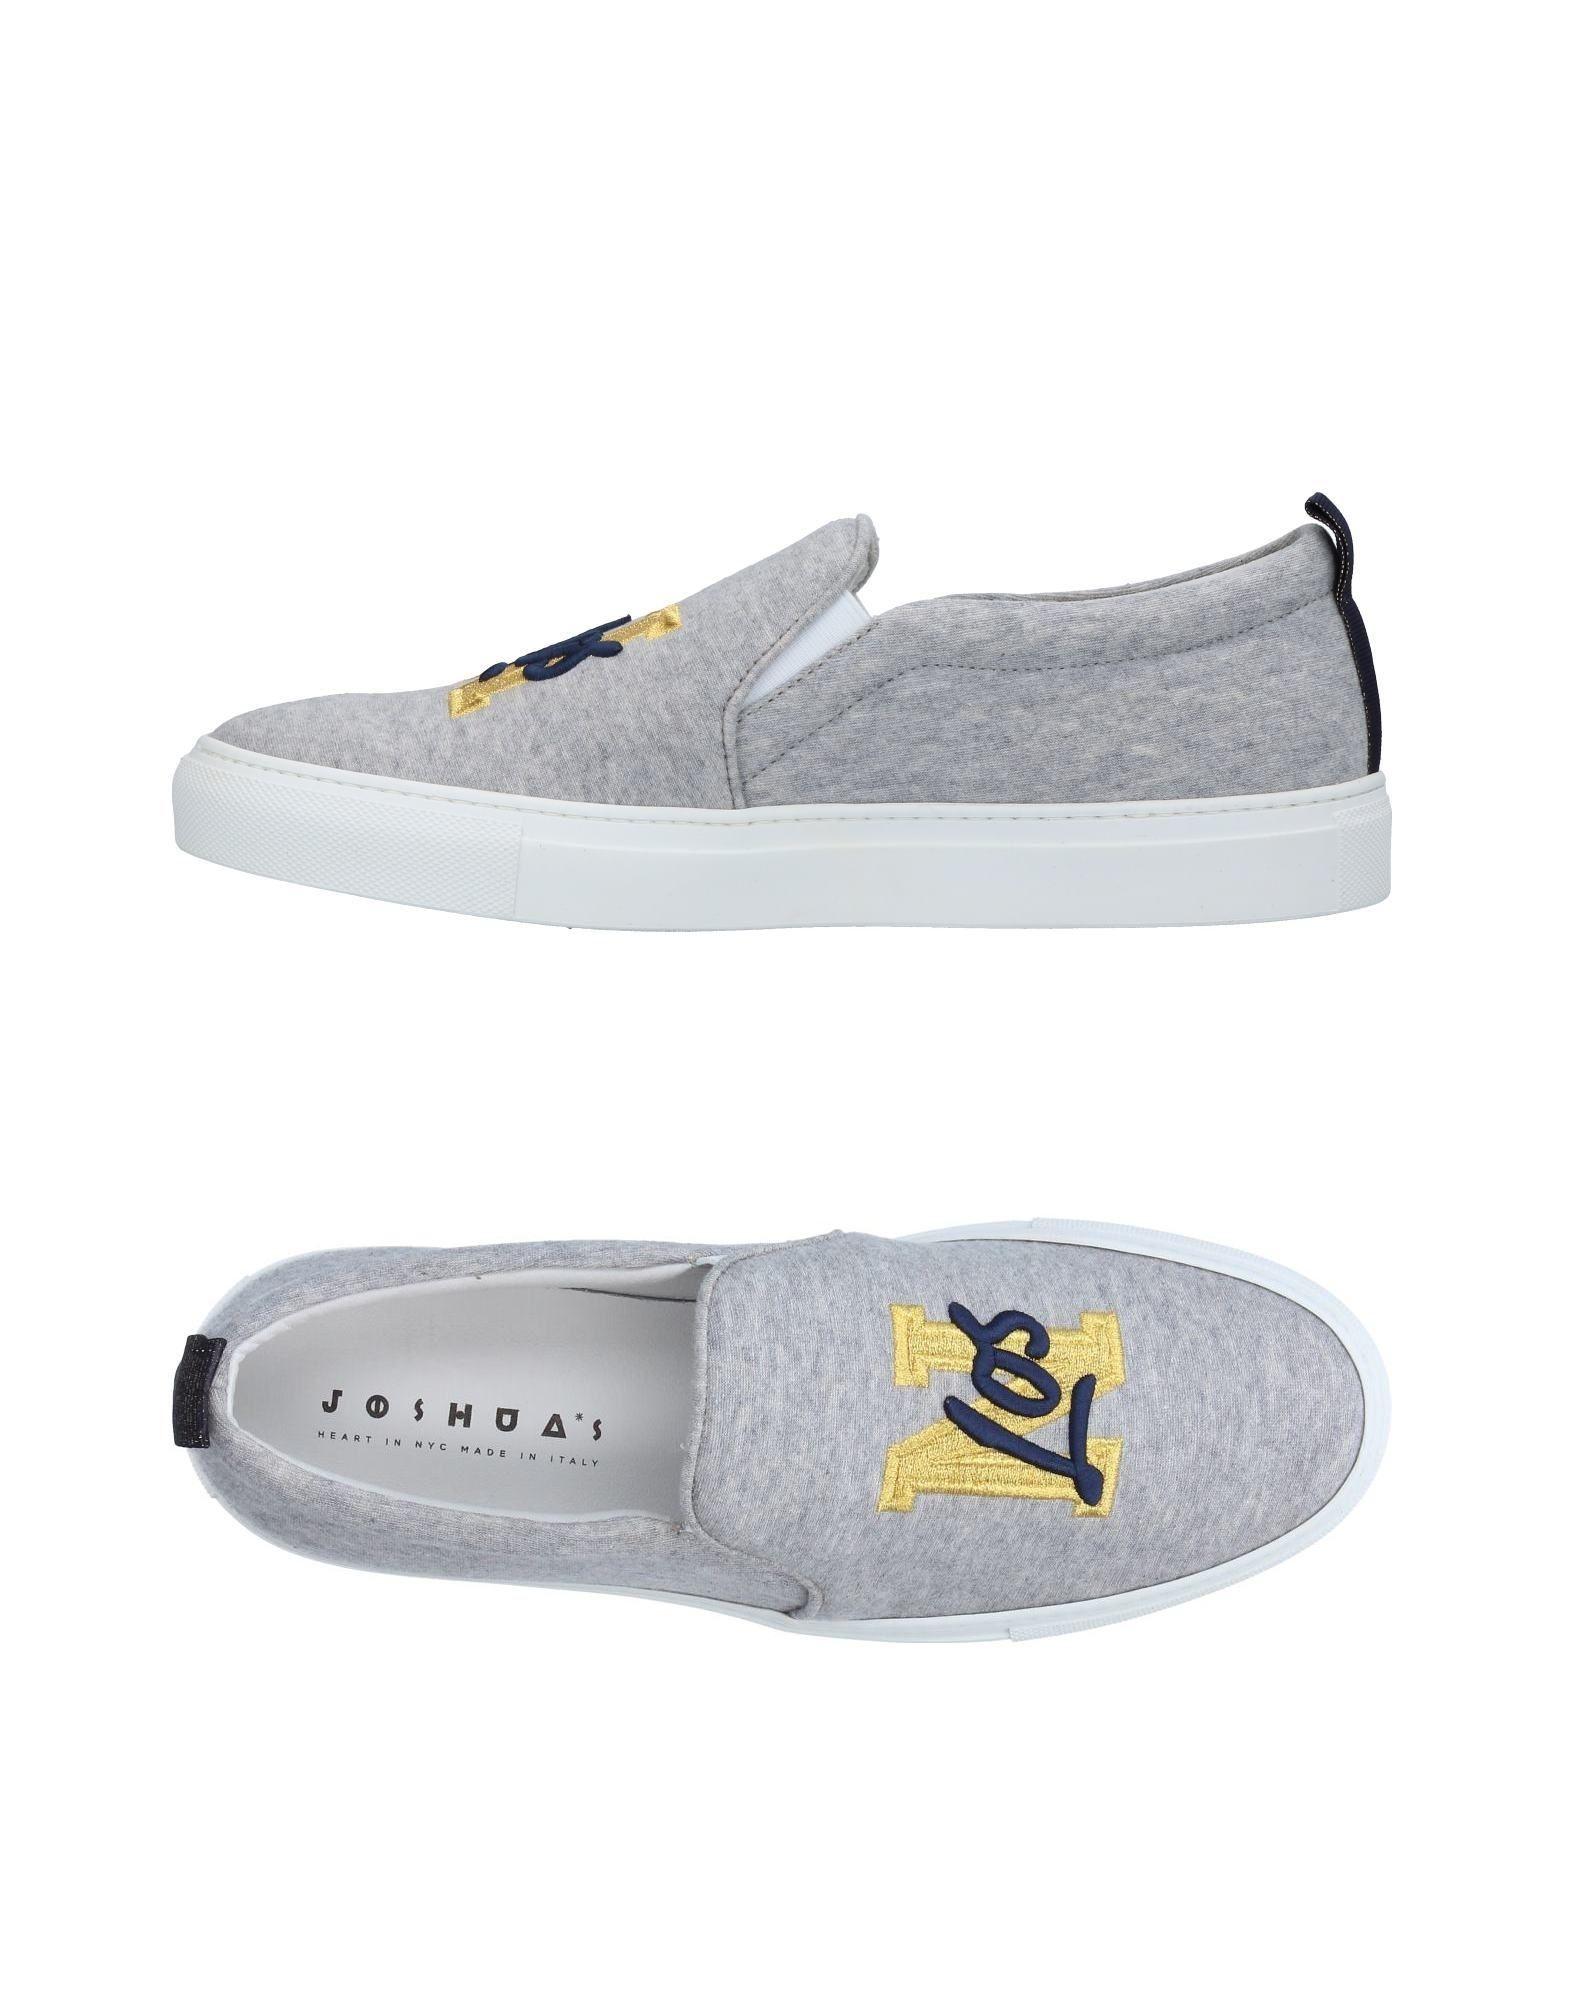 Moda Sneakers Joshua*S Uomo - 11364783QI